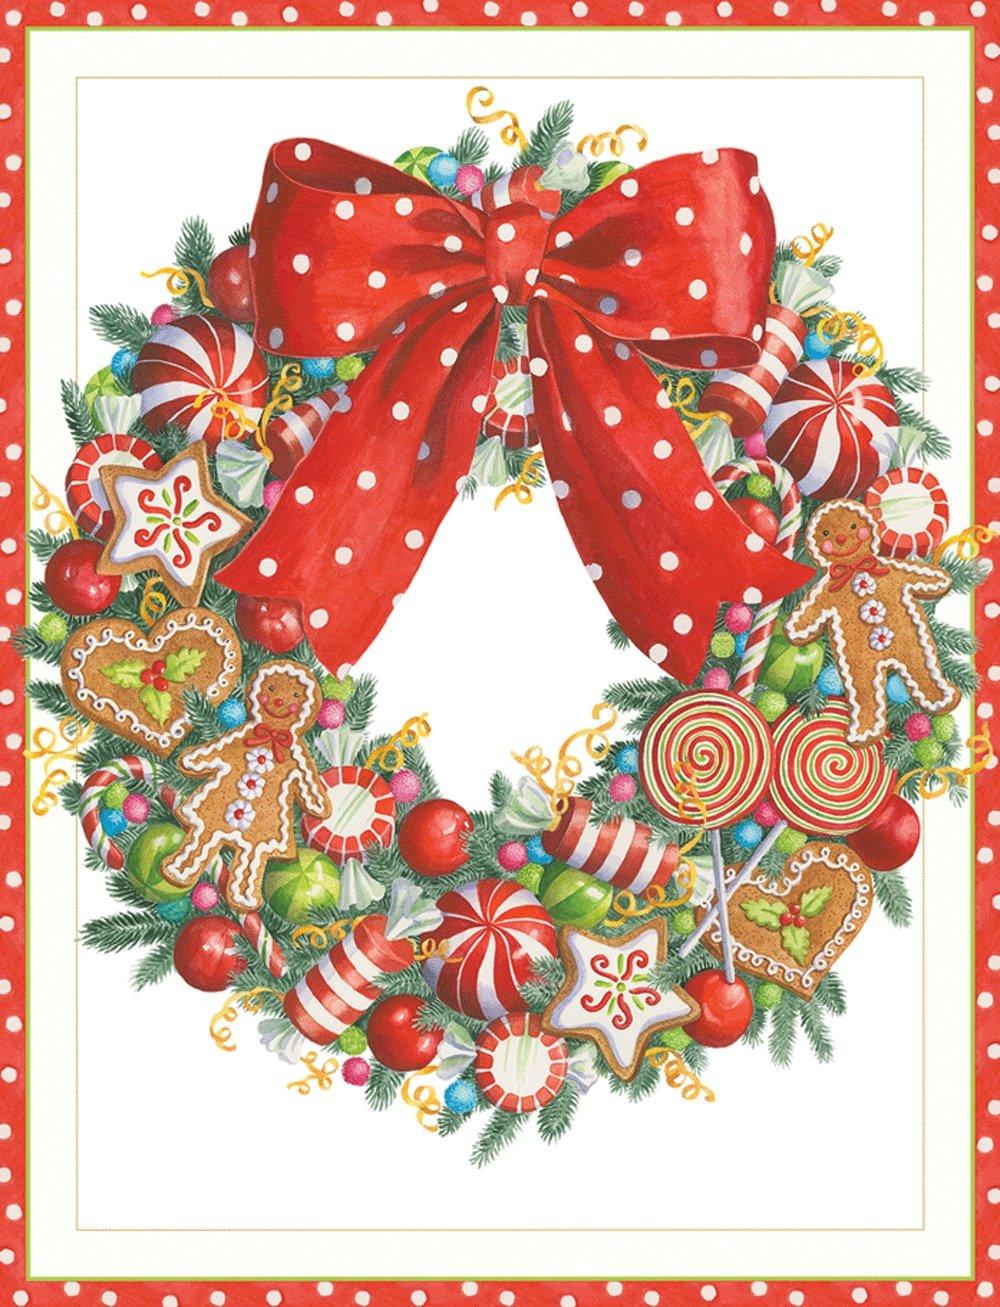 Entertaining with Caspari Candy Wreath Christmas Cards, Box of 16